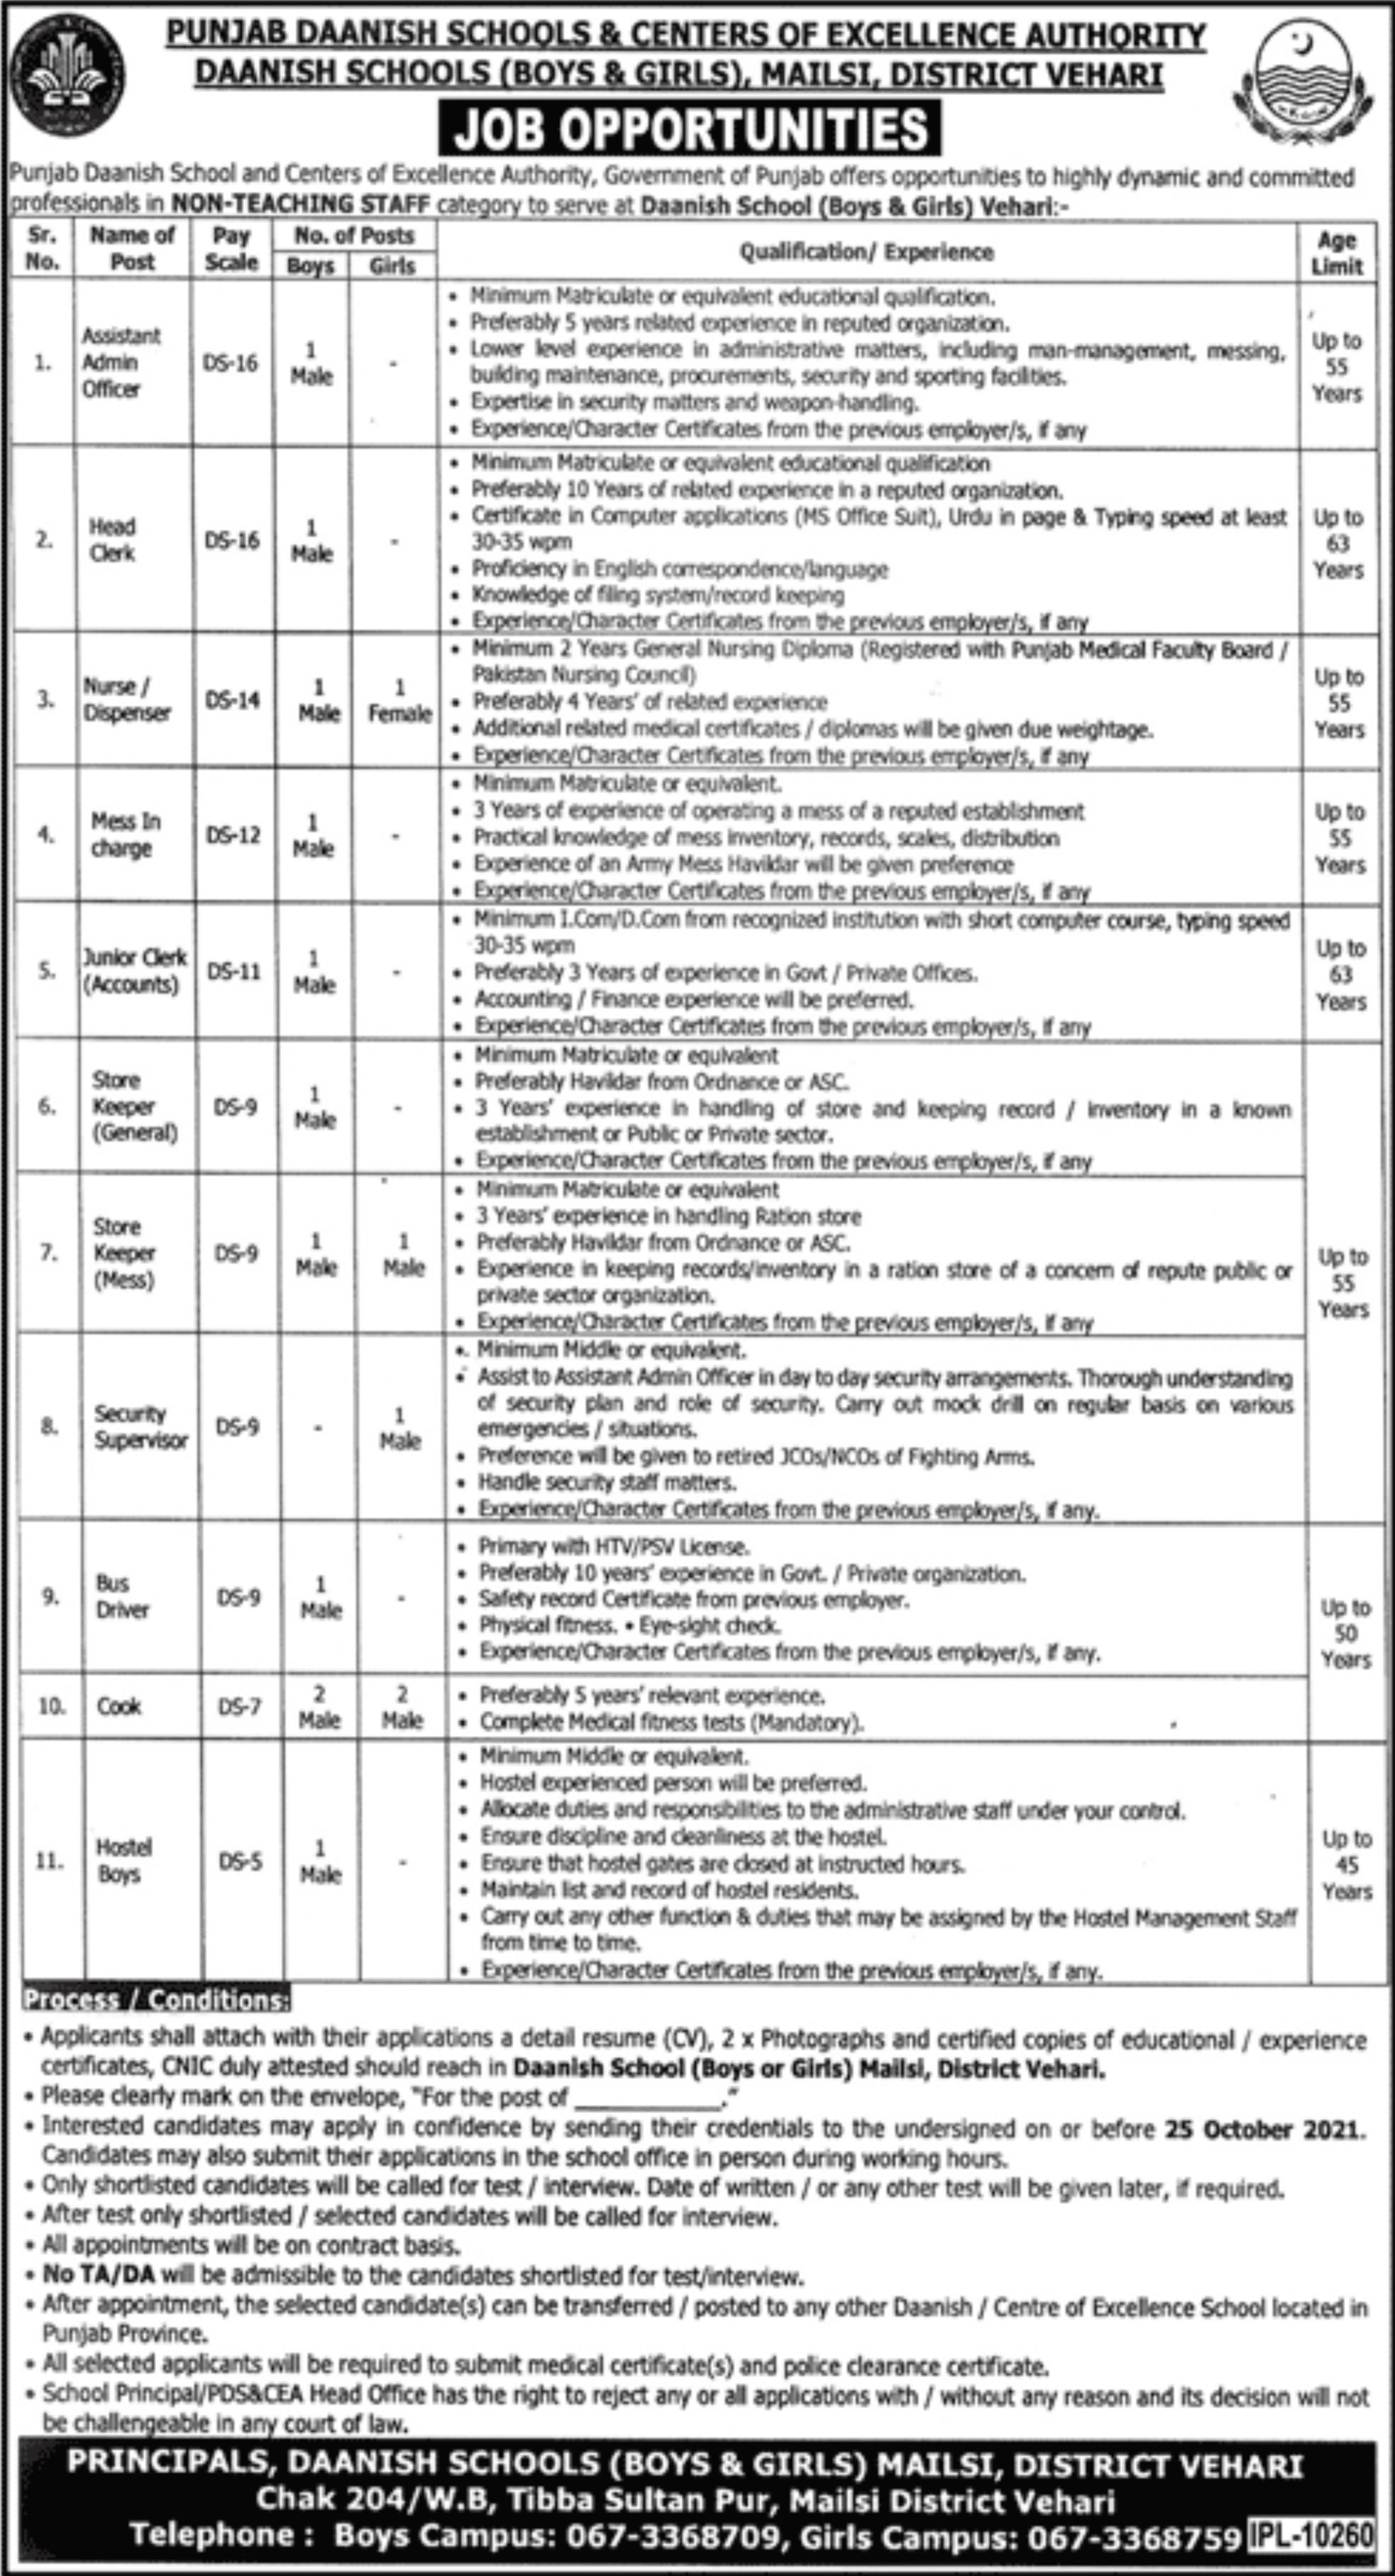 Punjab Daanish Schools & Centers of Excellence Authority Vacancies 2021 – Latest Jobs 3